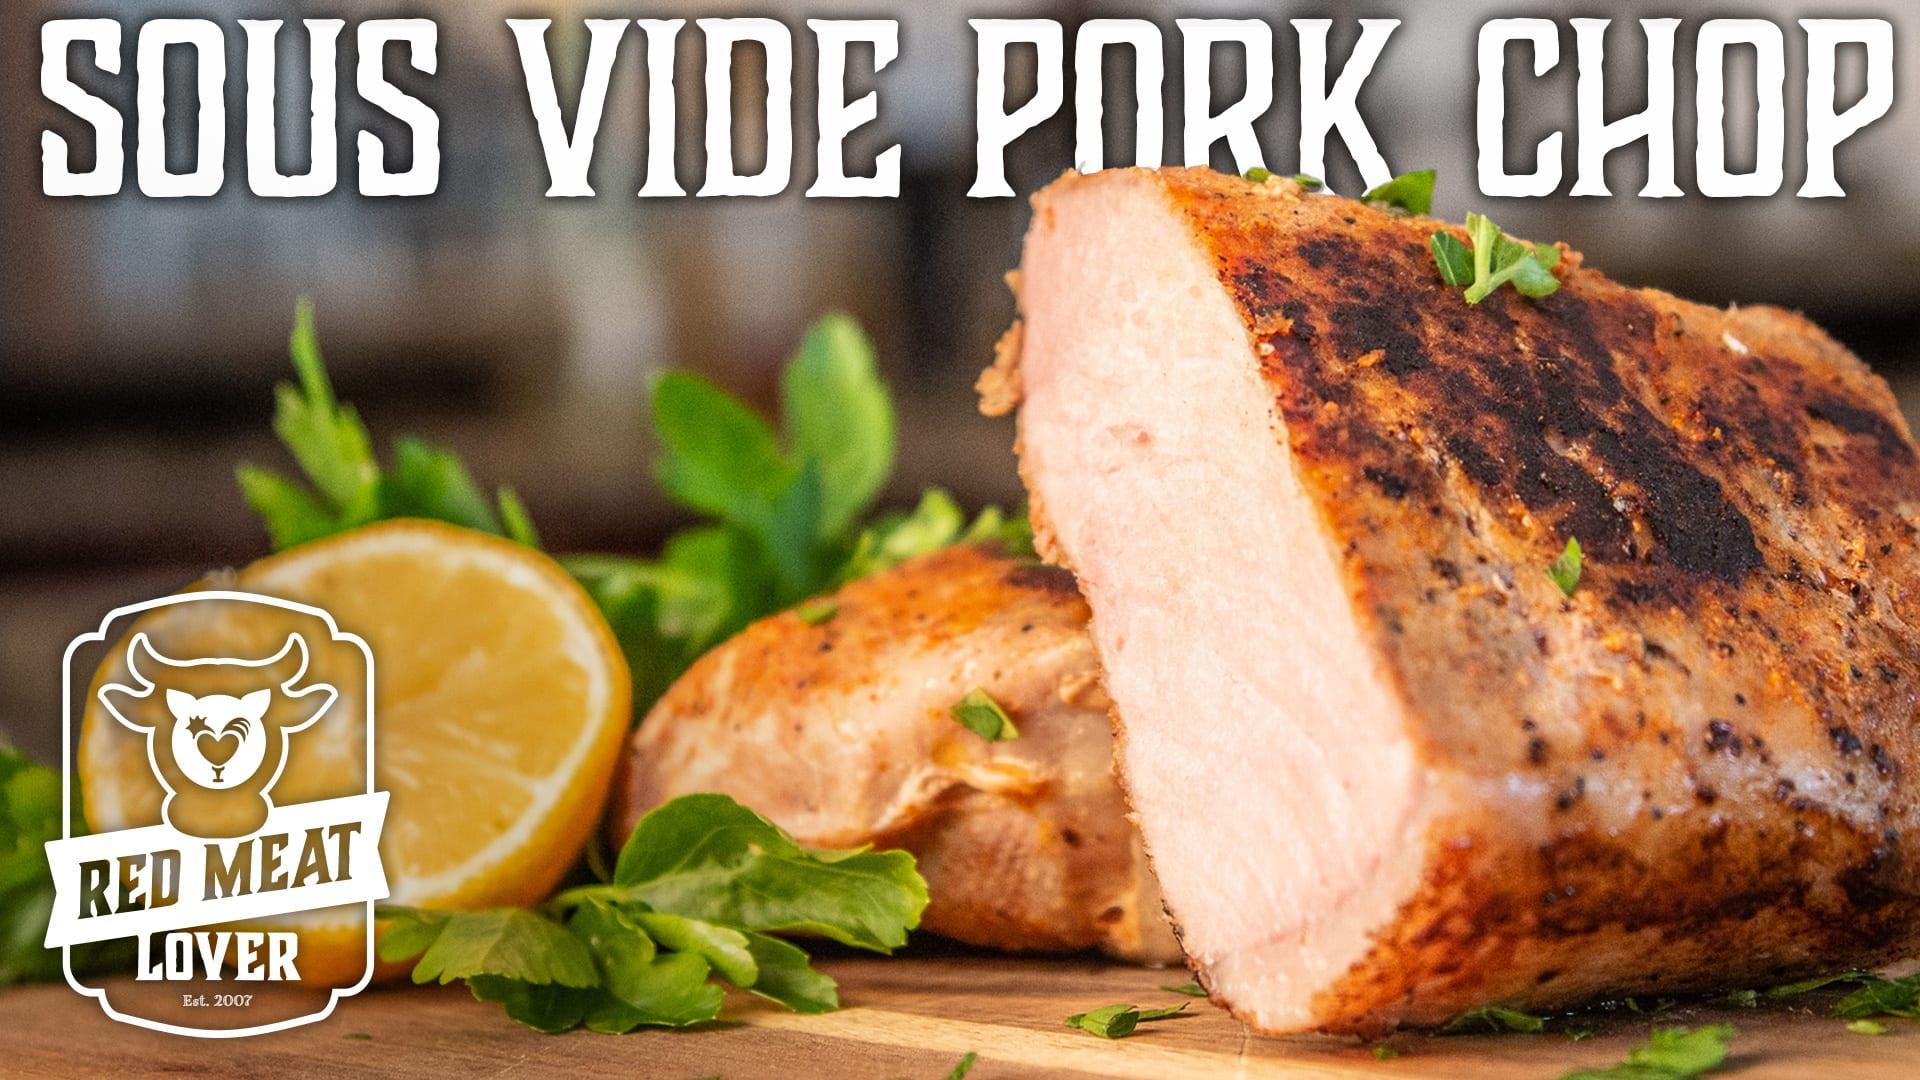 Sous Vide Pork Chop